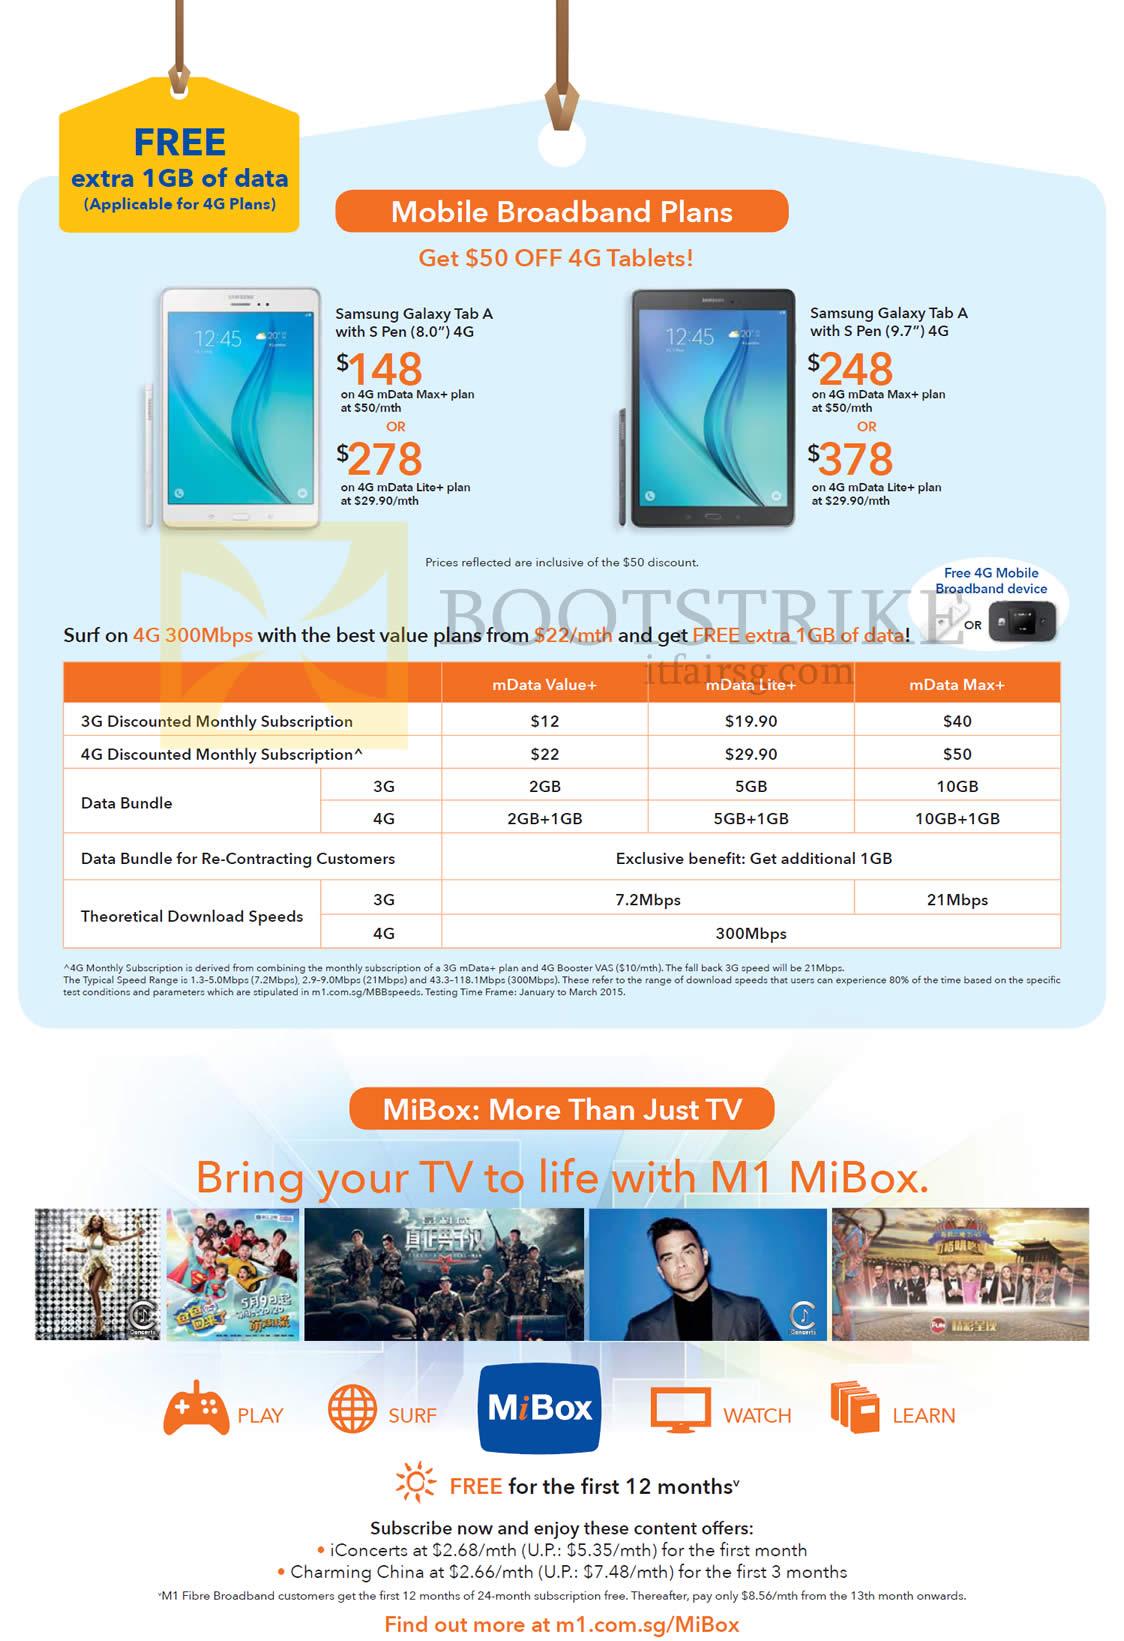 Mobile Broadband Plans mData, Samsung Galaxy Tab A, MiBox